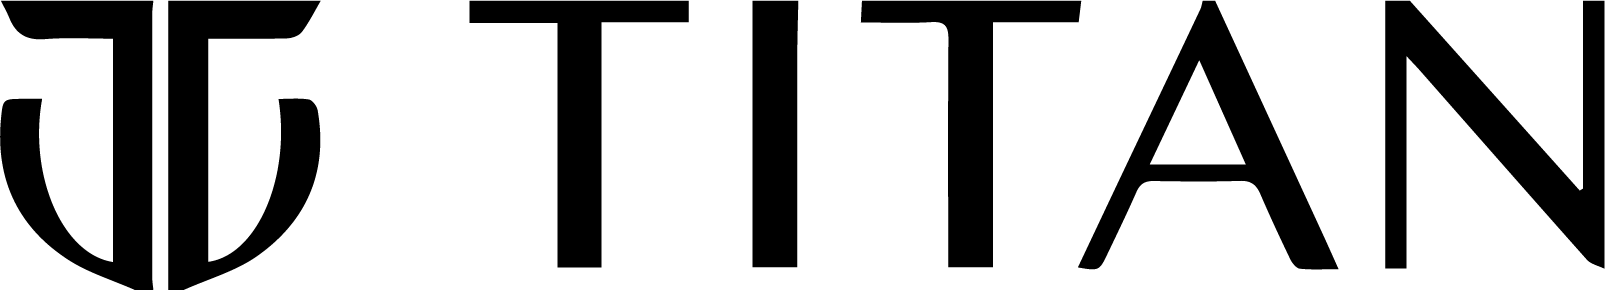 Titan Logo png